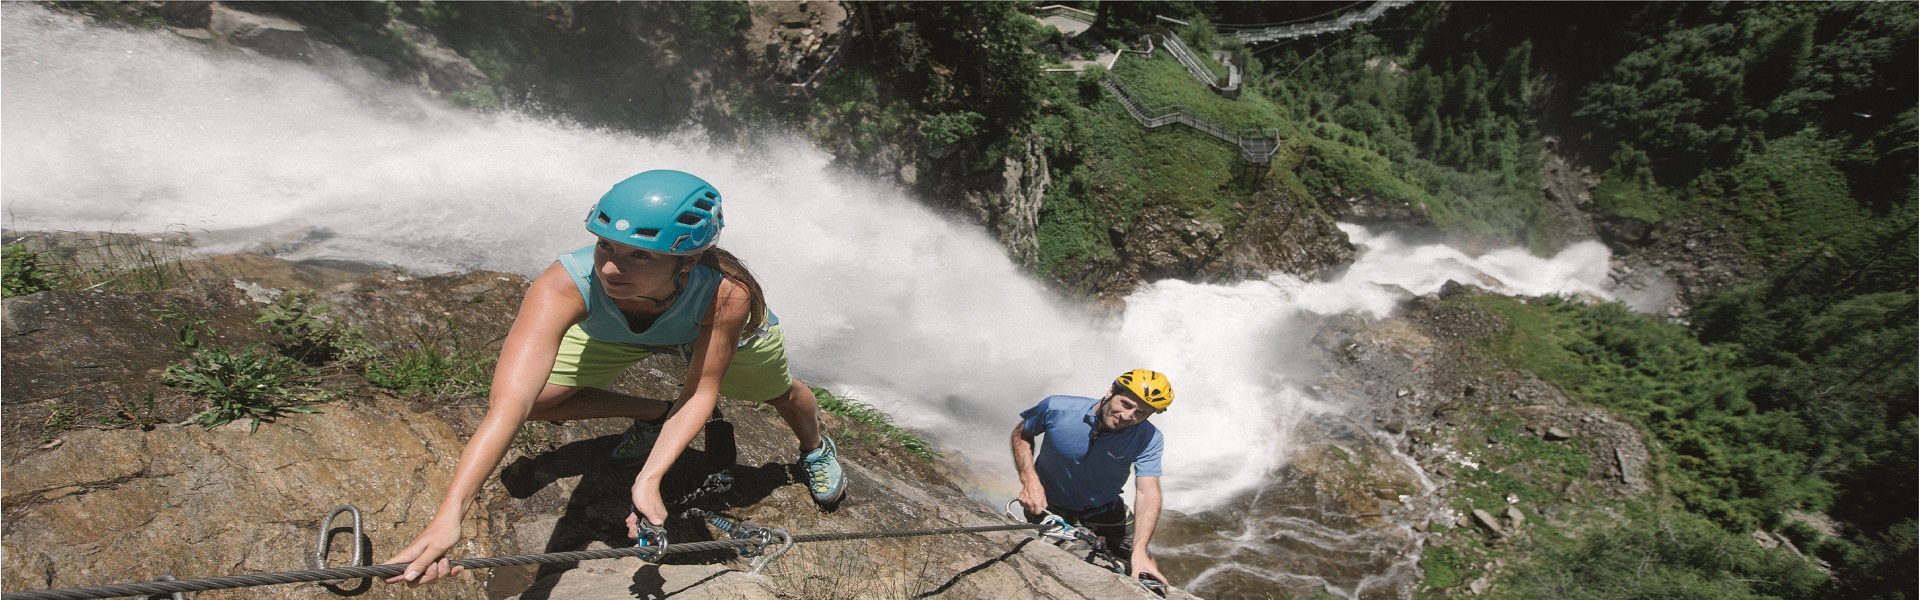 Ötztal Camping Tirol Klettersteig